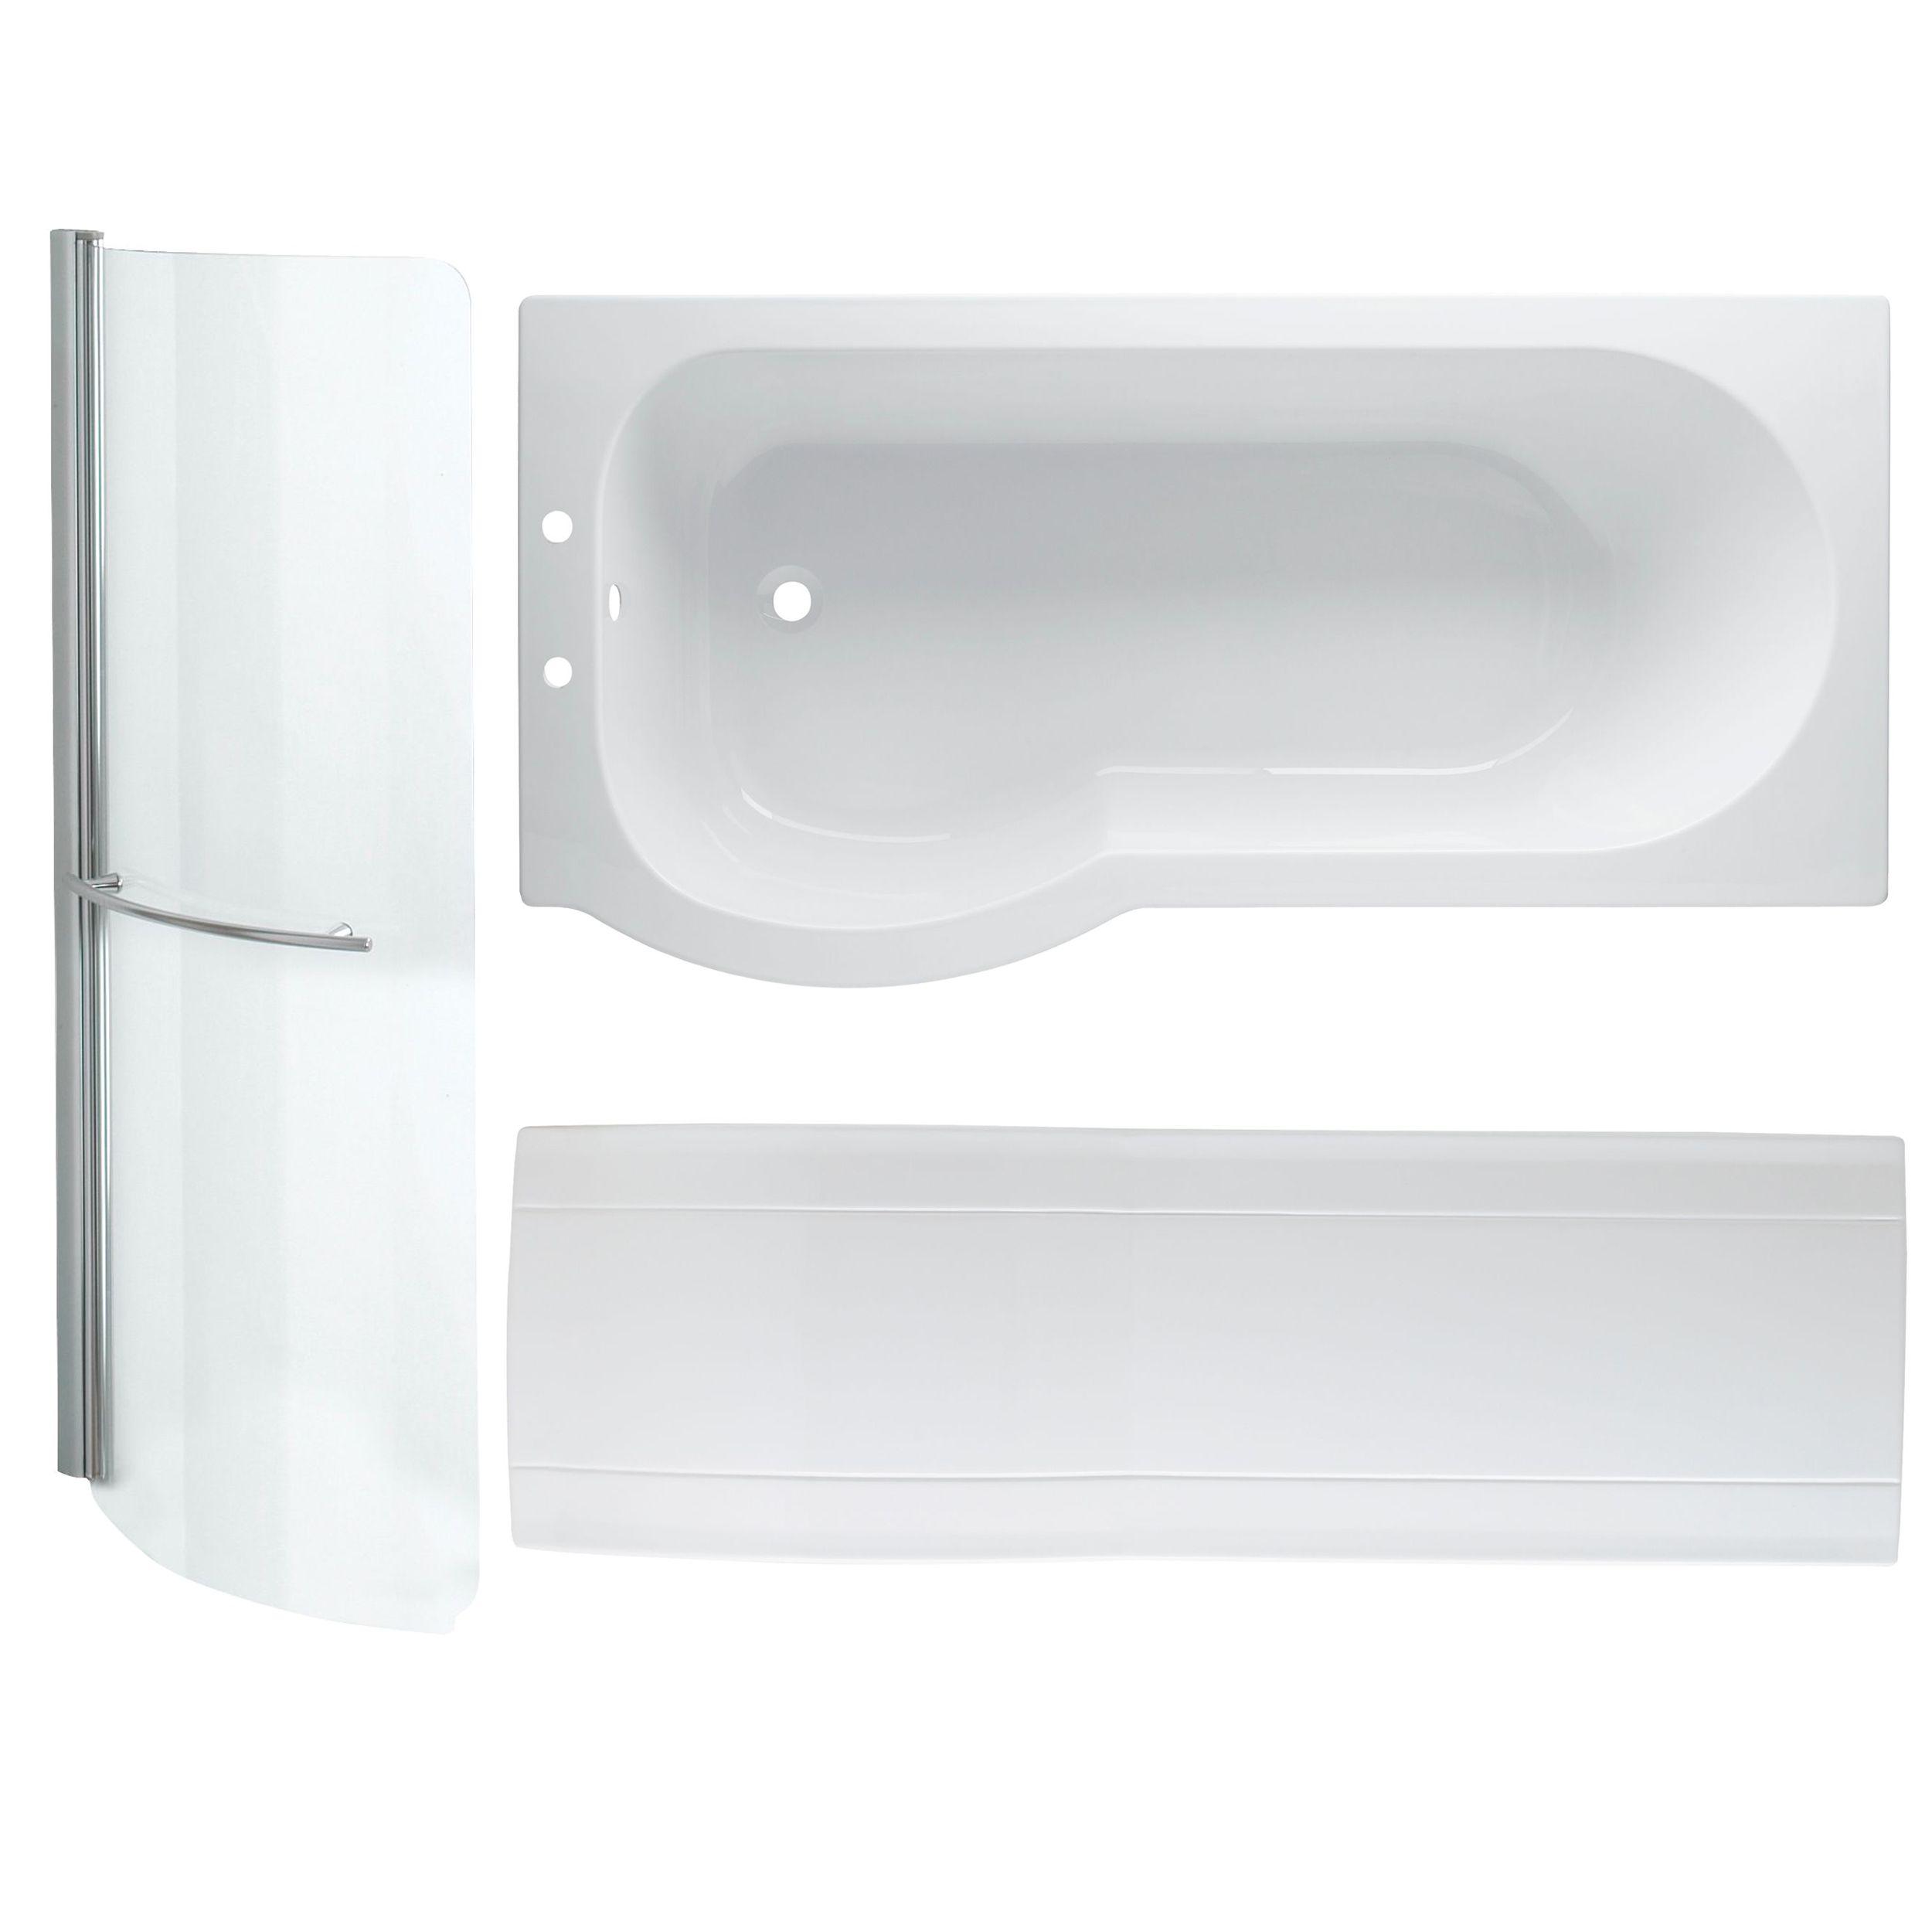 Cooke Lewis Adelphi P Shaped Shower Bath Panel Screen Set L 1675mm W 850mm Departments Diy At B Q